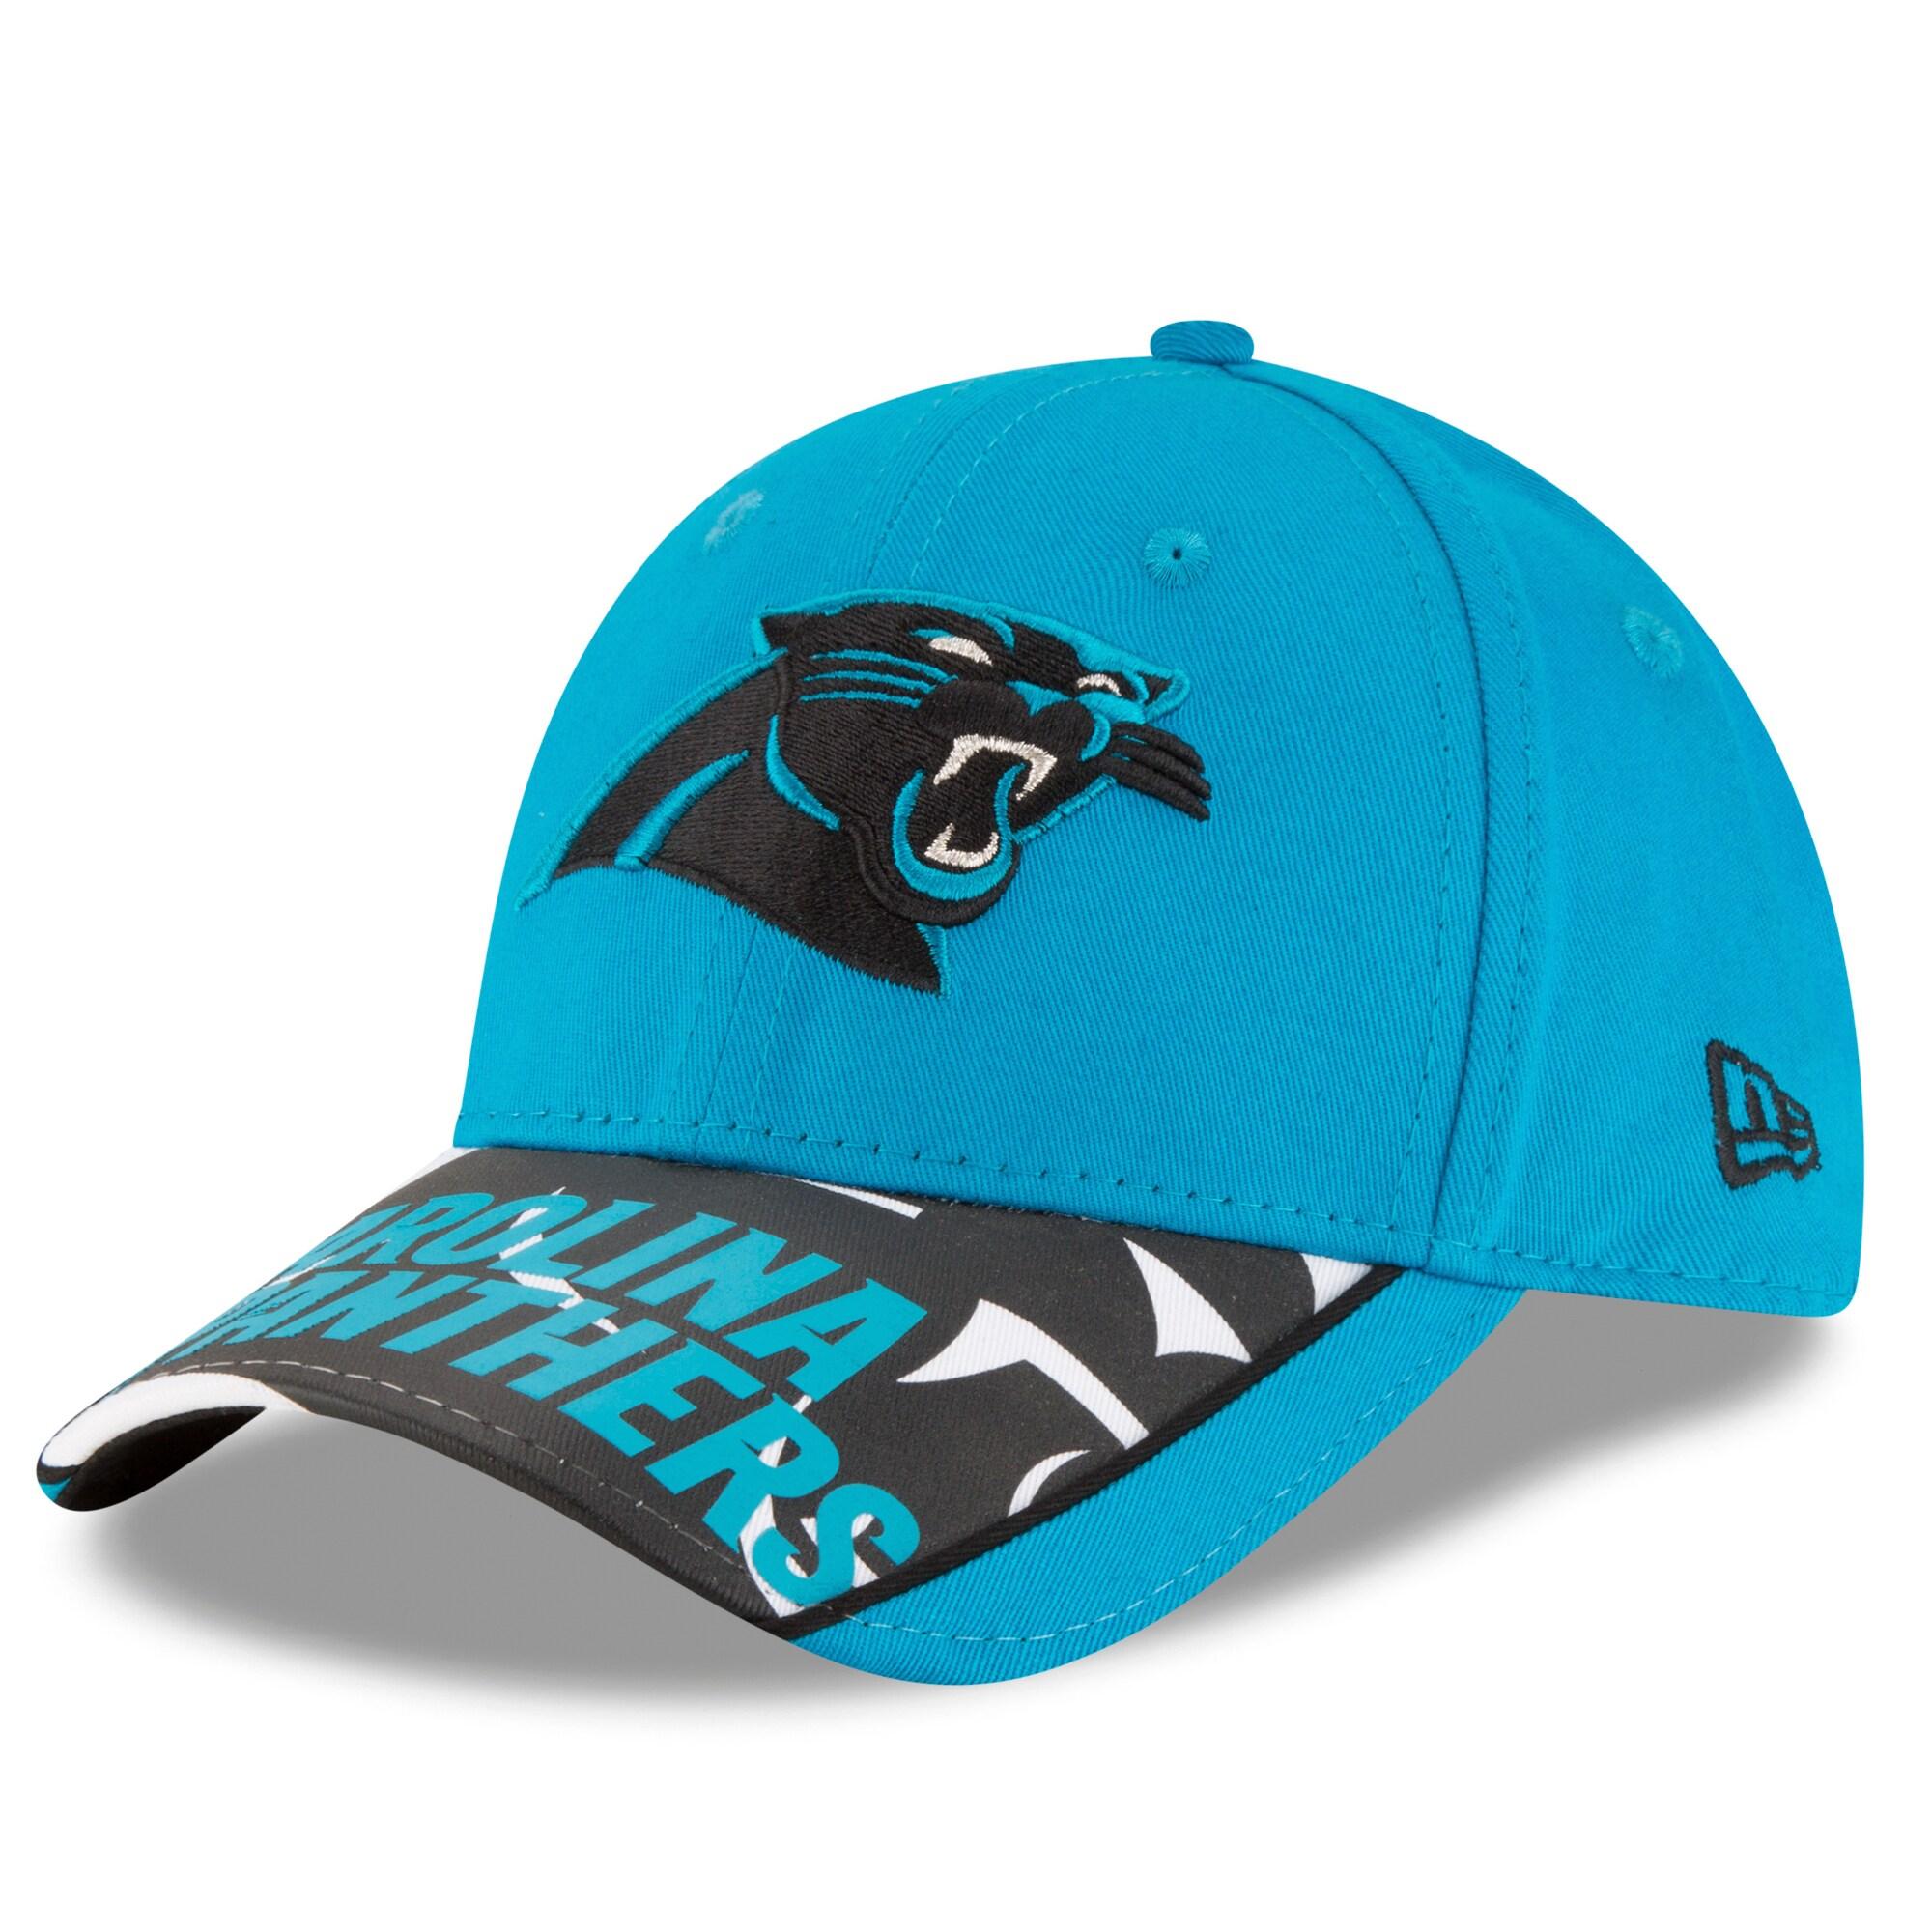 Carolina Panthers New Era Logo Scramble 9FORTY Adjustable Hat - Blue